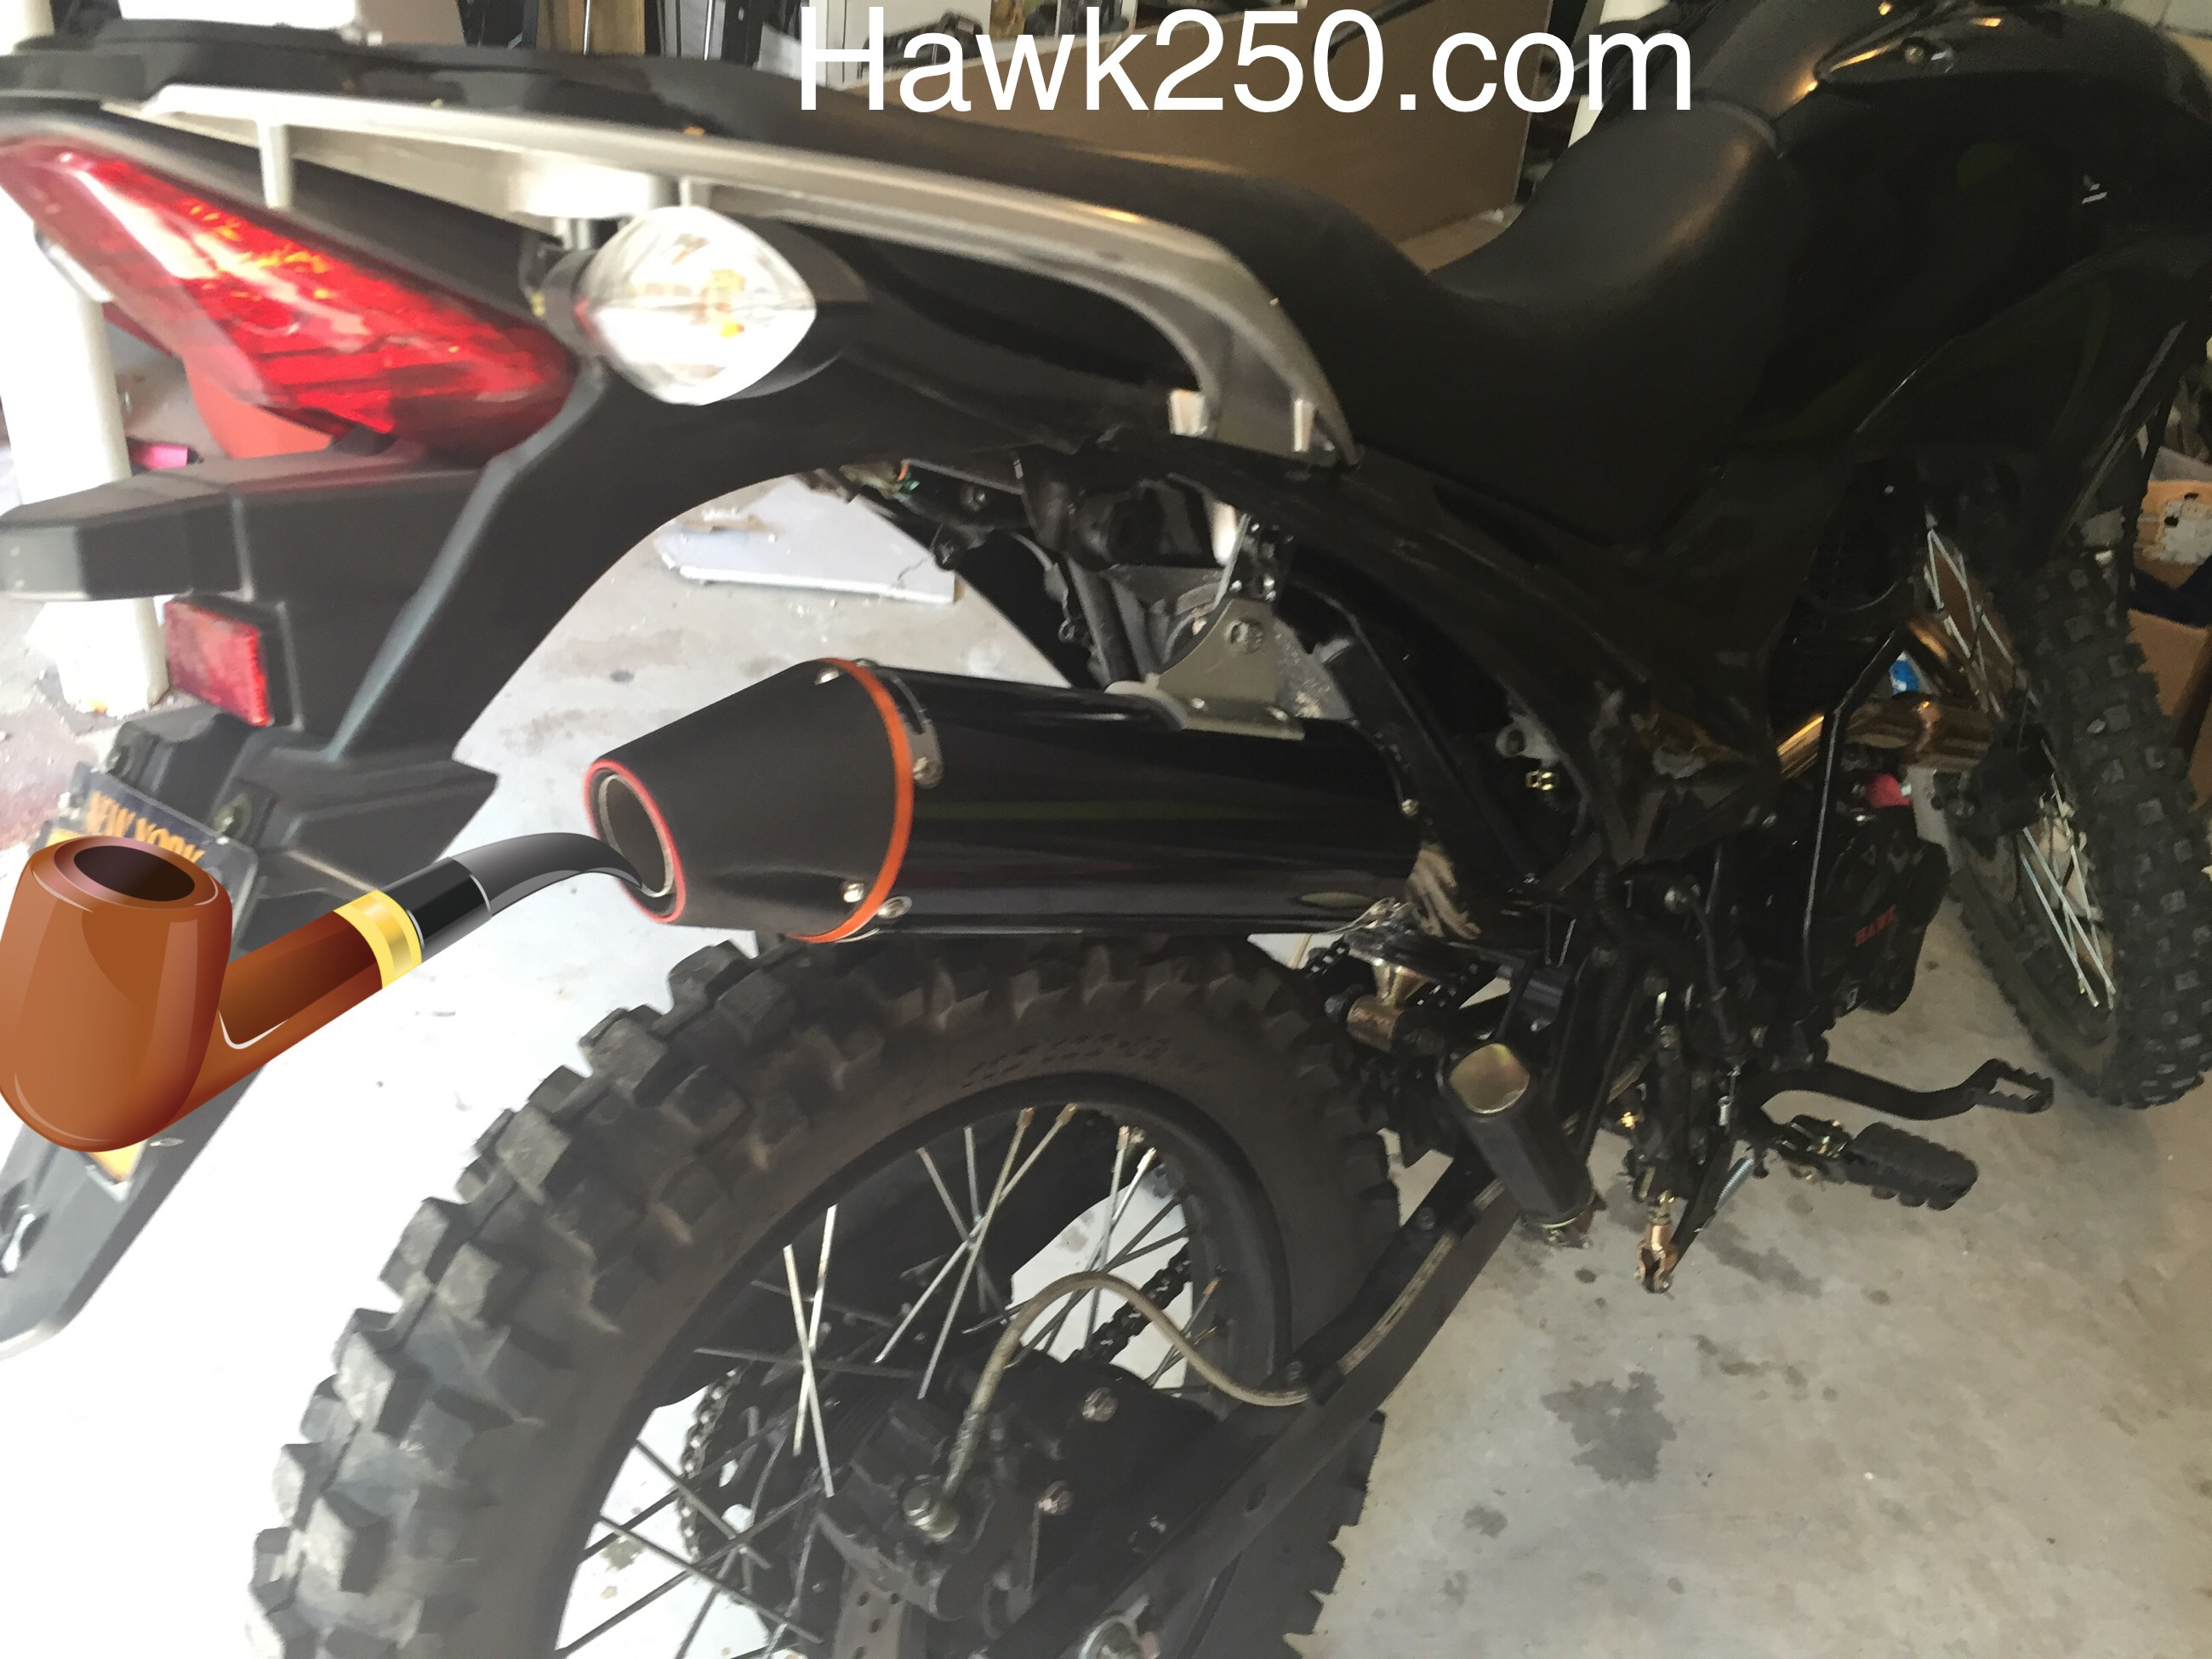 Extra Power Hawk 250 Exhaust